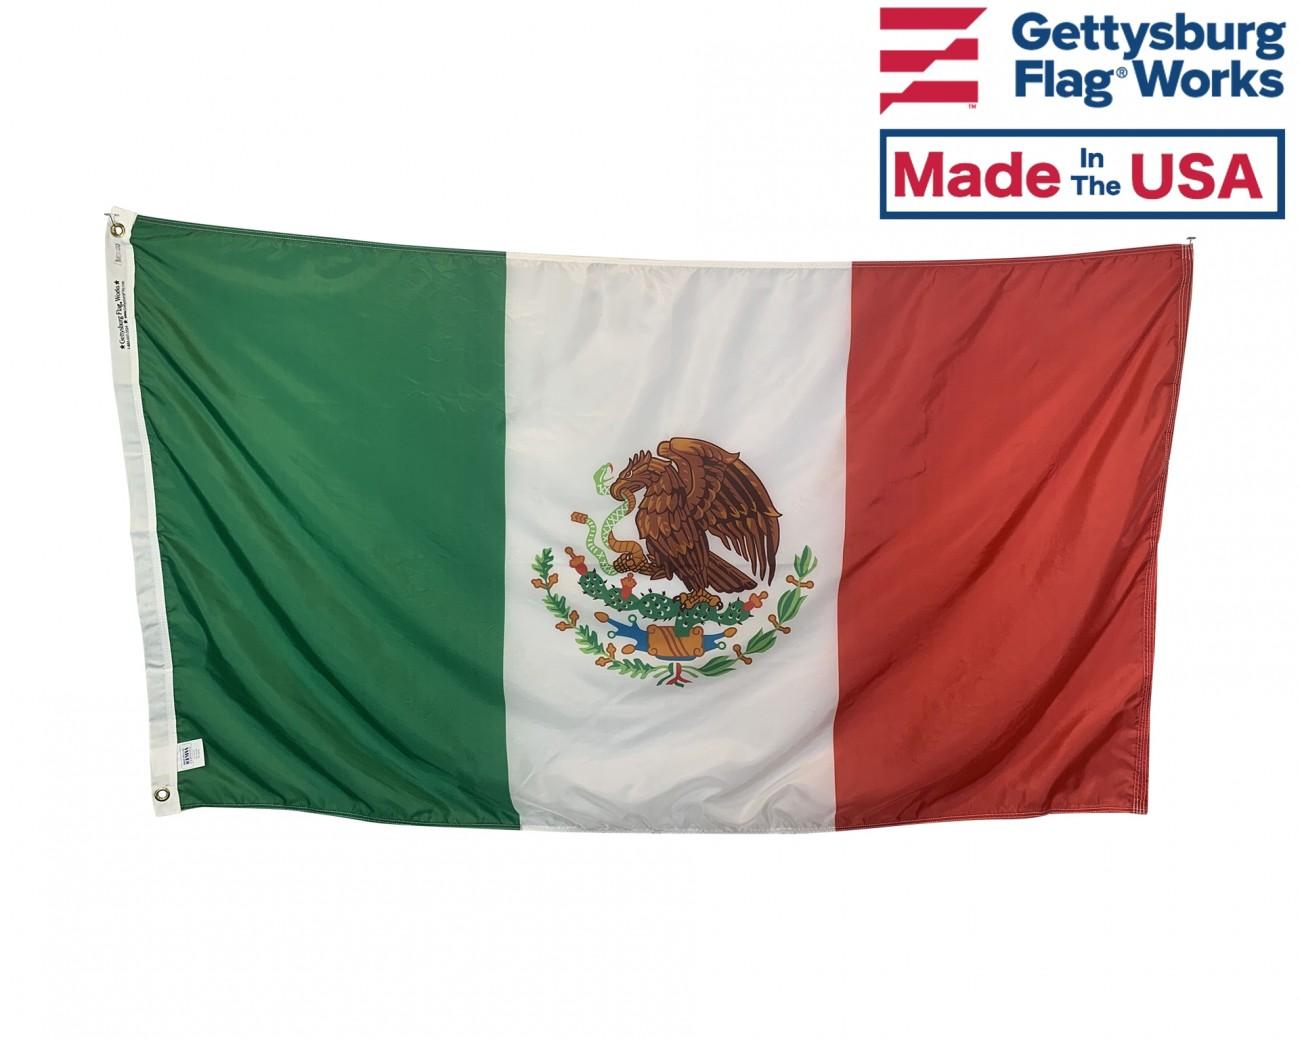 Mexico Flag - Durable, High Quality Mexican Flags